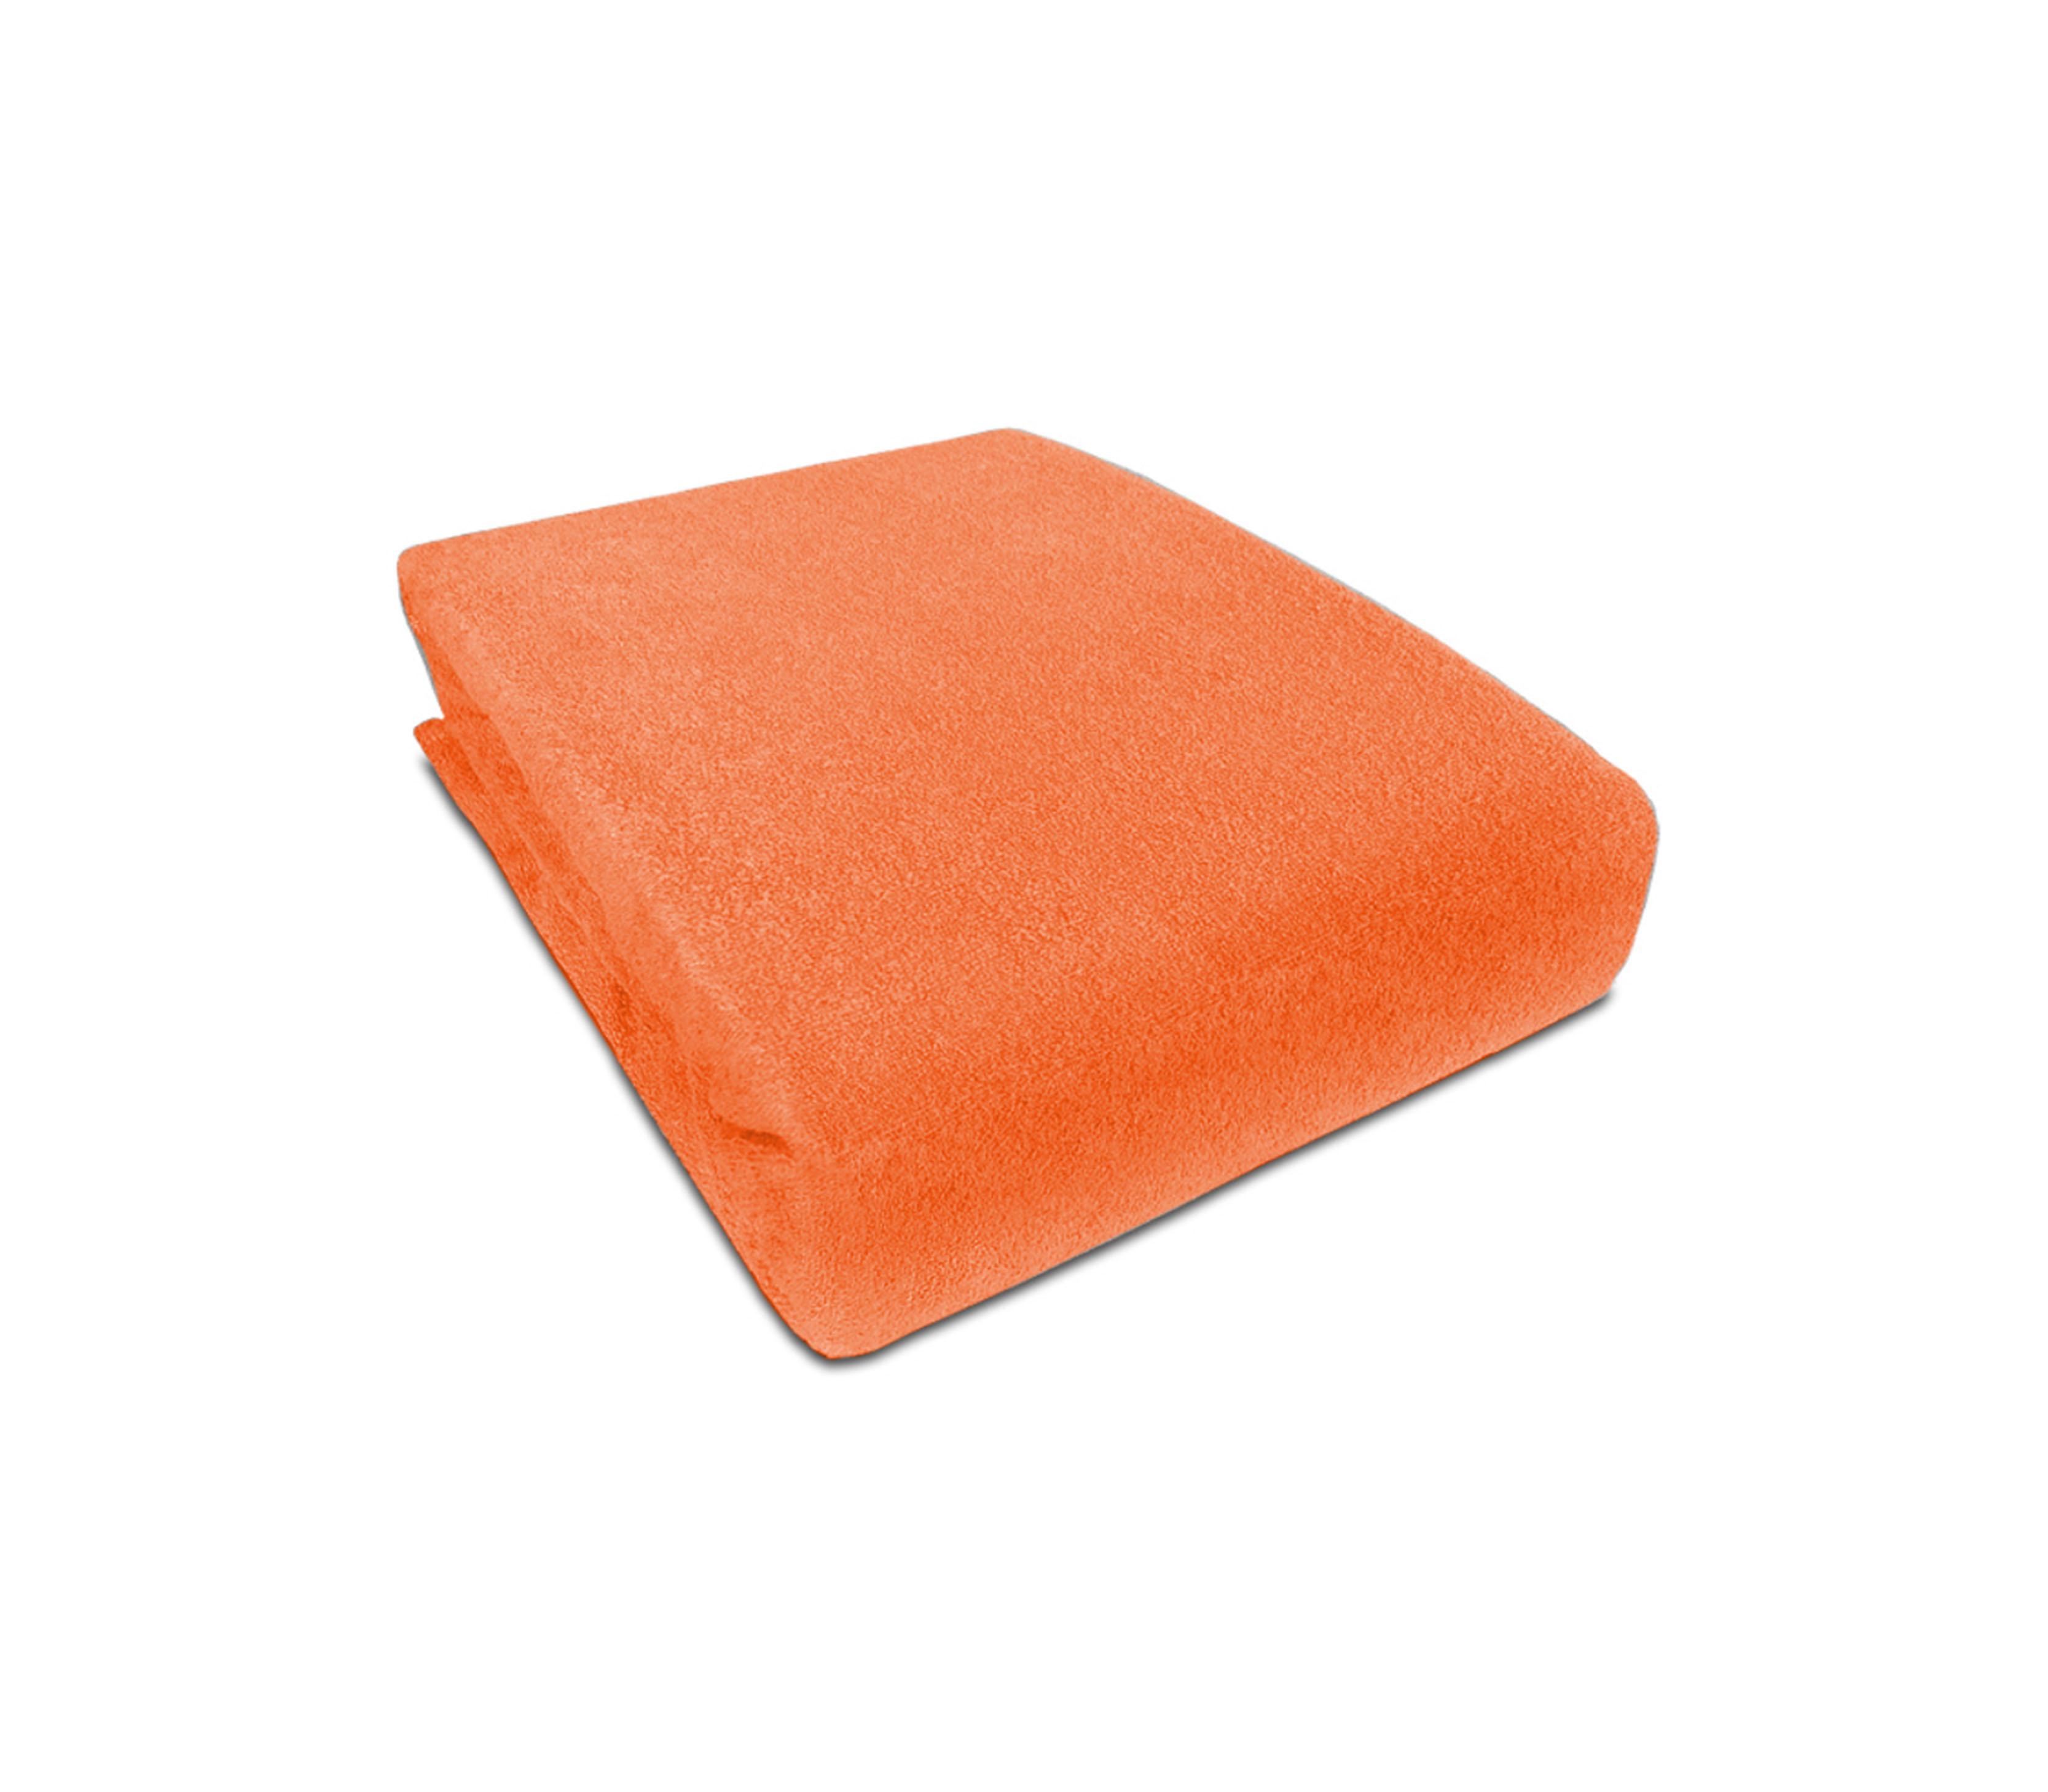 Aga prostěradlo FROTÉ 180X200 cm Barva prostěradla: Oranžová